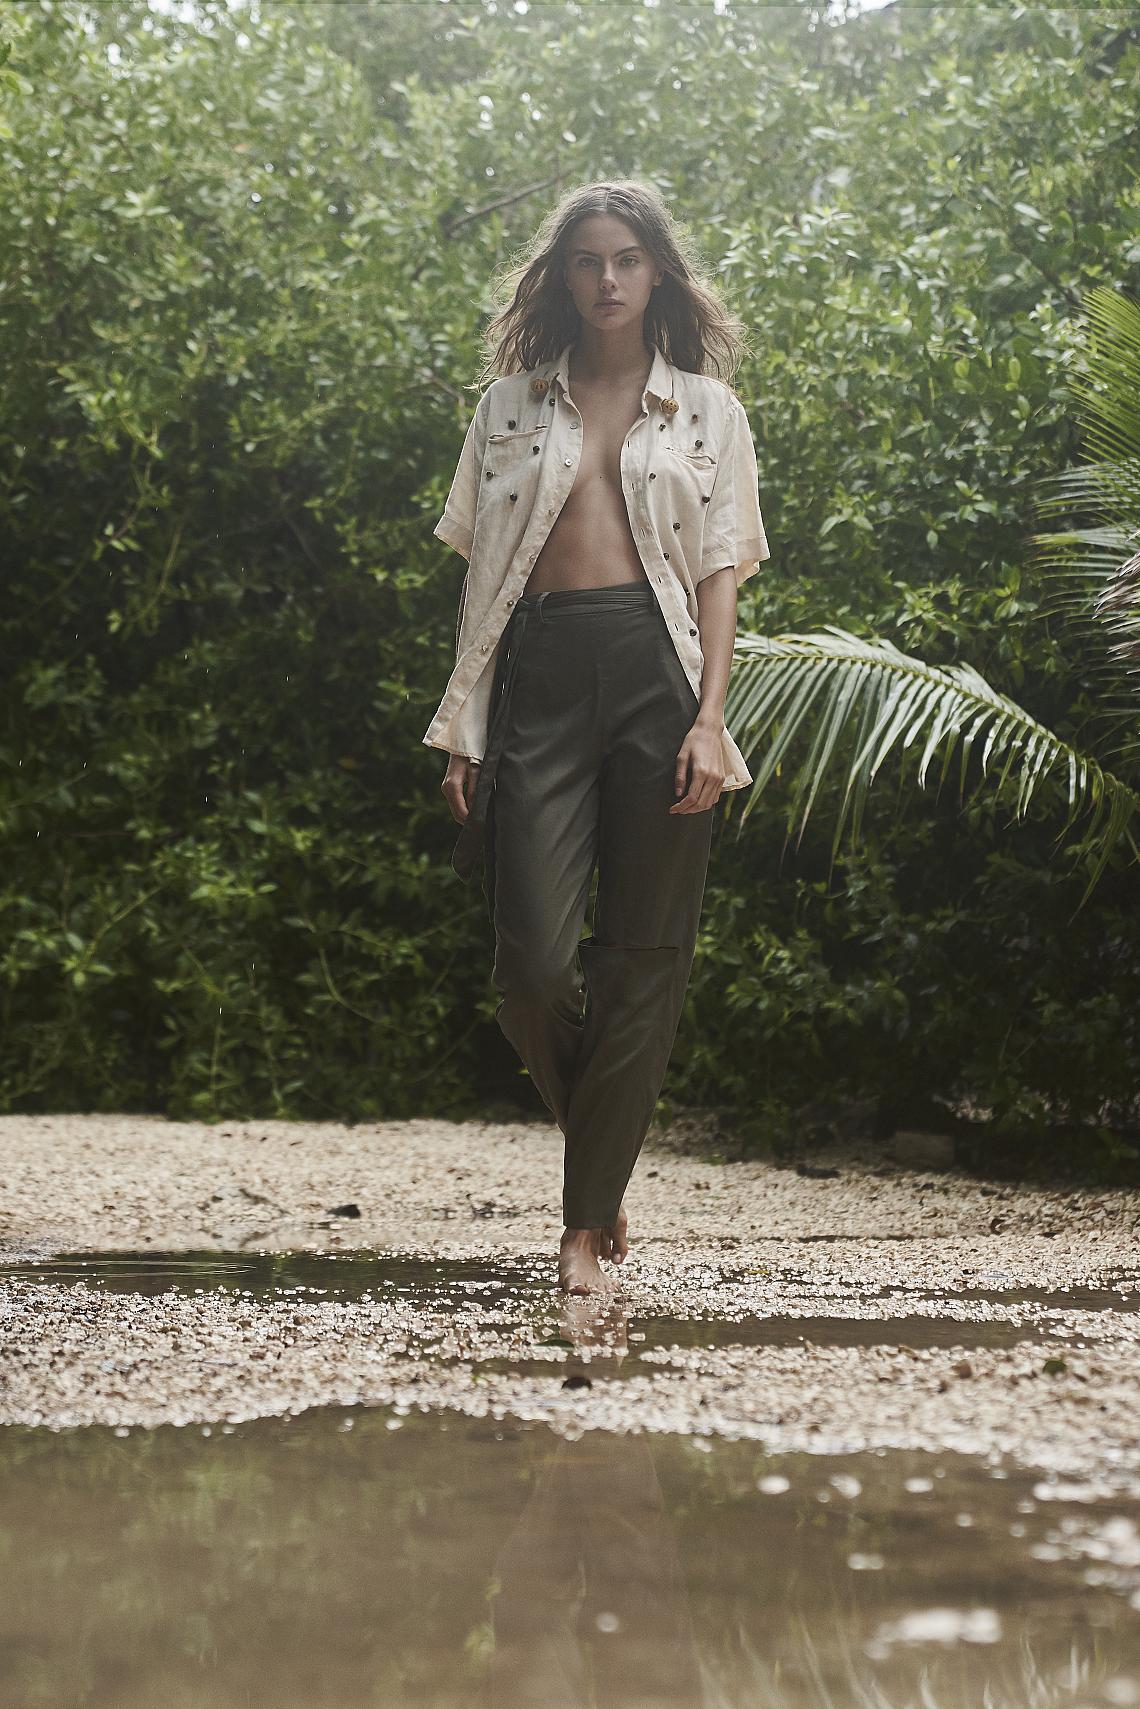 <p>Топ Viuda Ramirez (@viudaramirez), панталони Carmen Llaguno by Rüütel (@ruutelmx)</p><p><br></p><p>Фотографии Rodrigo Palma (@ropalma), модел Kate Demianova (@kate_demianova), коса Kim Garduno using Oribe (@kimgarduno), продукция CuatroArtists (@cuatroartists), локация Casa Xaman Tulum (@casa_xaman)<br></p>